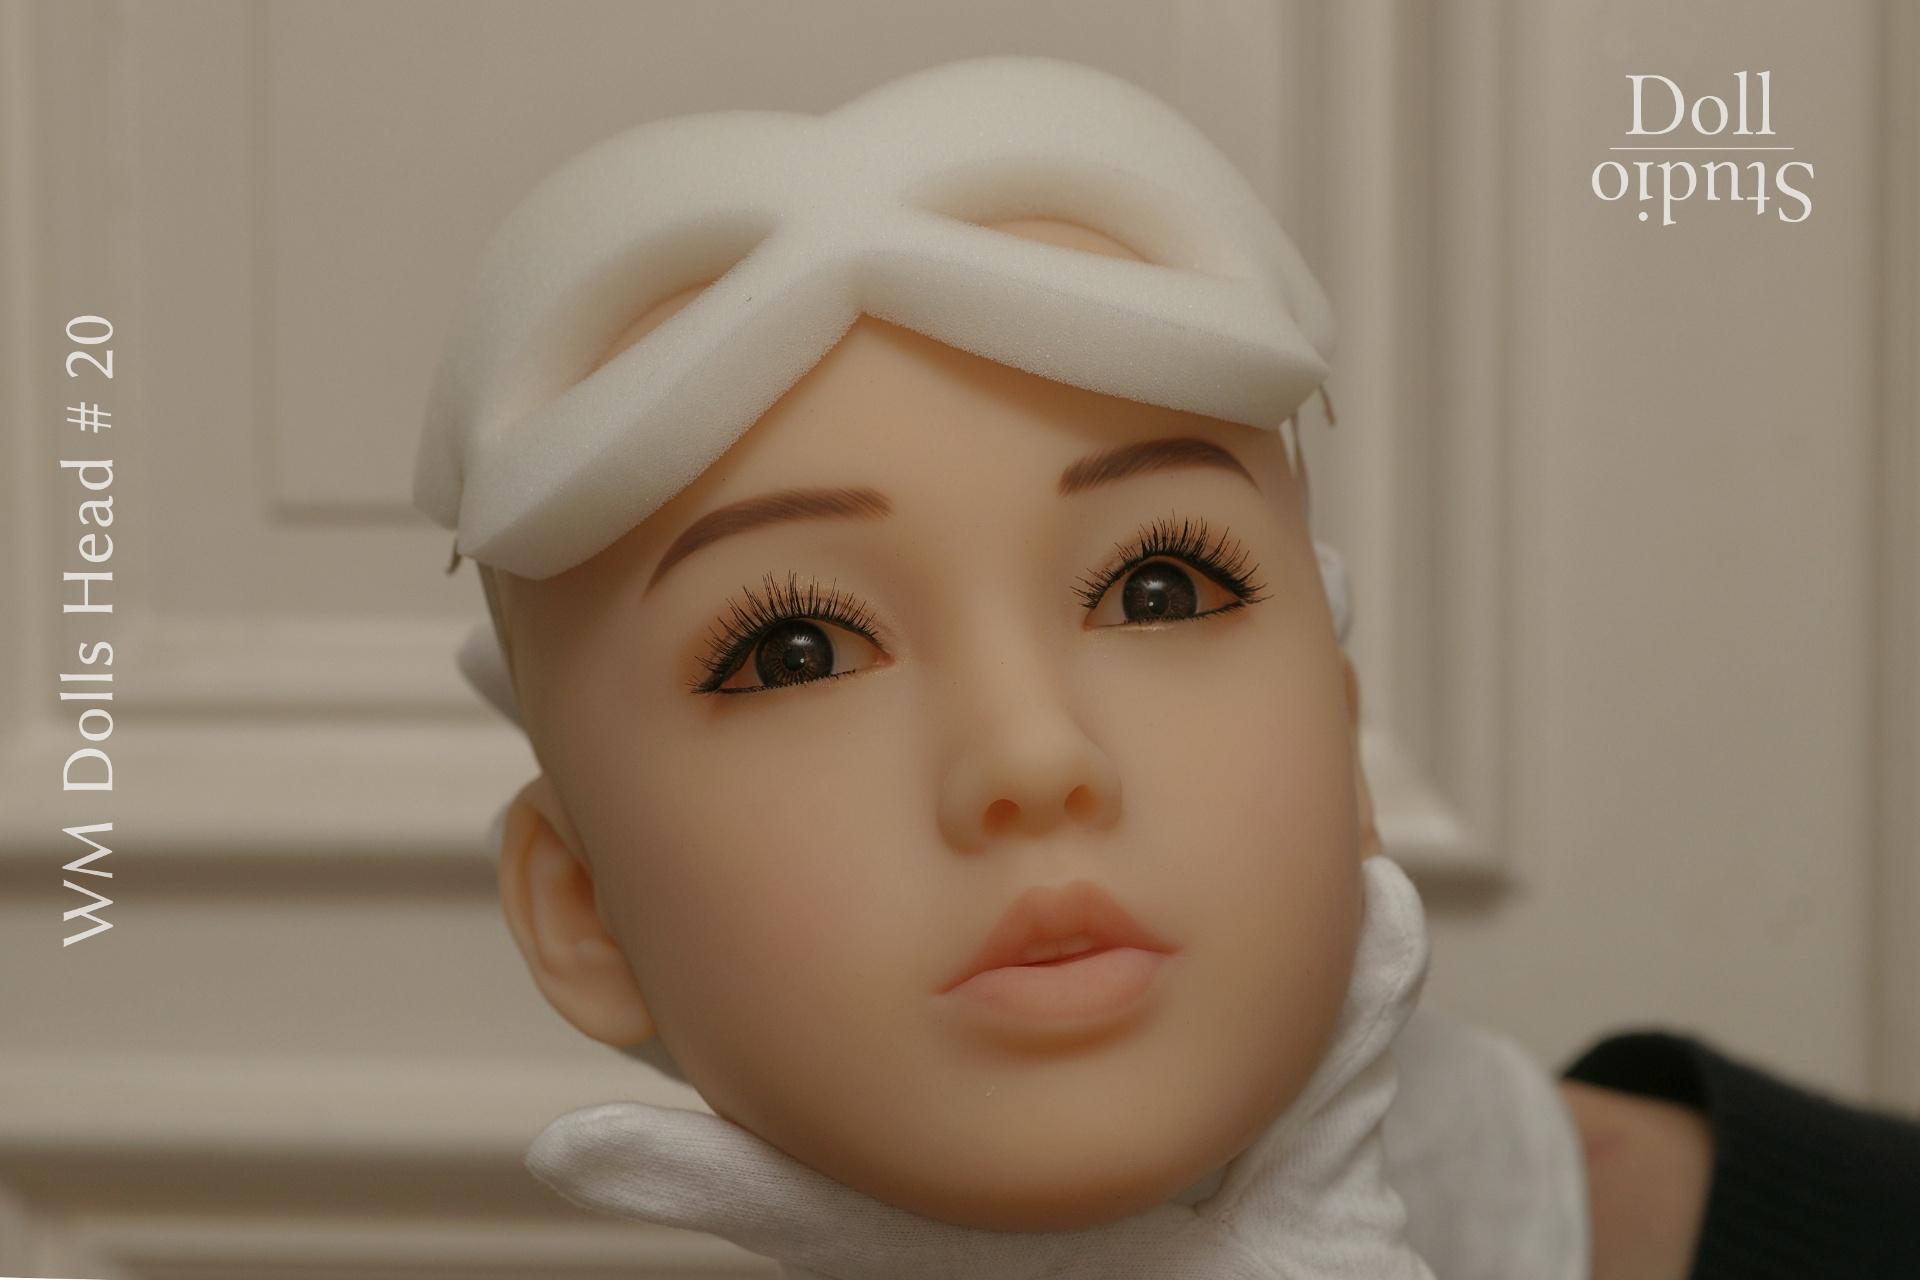 wm doll head no 20 heads dollstudio eu. Black Bedroom Furniture Sets. Home Design Ideas